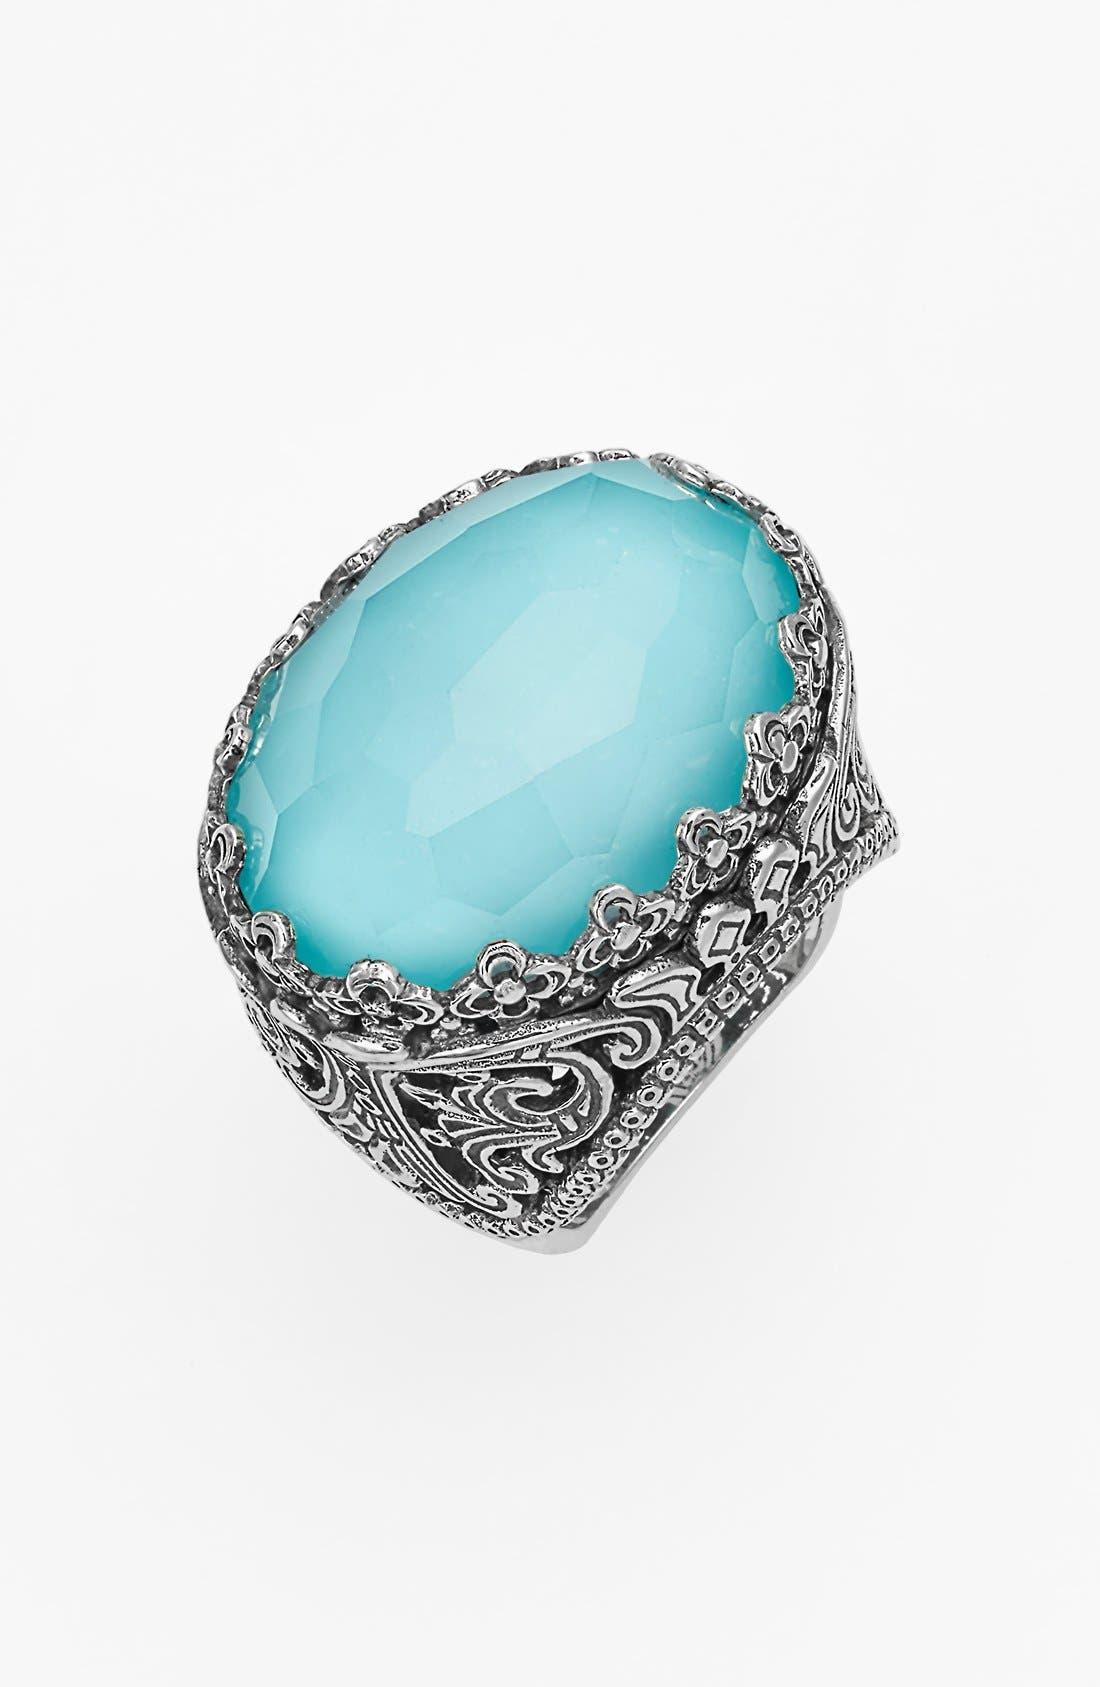 Main Image - Konstantino 'Aegean' Oval Stone Ring